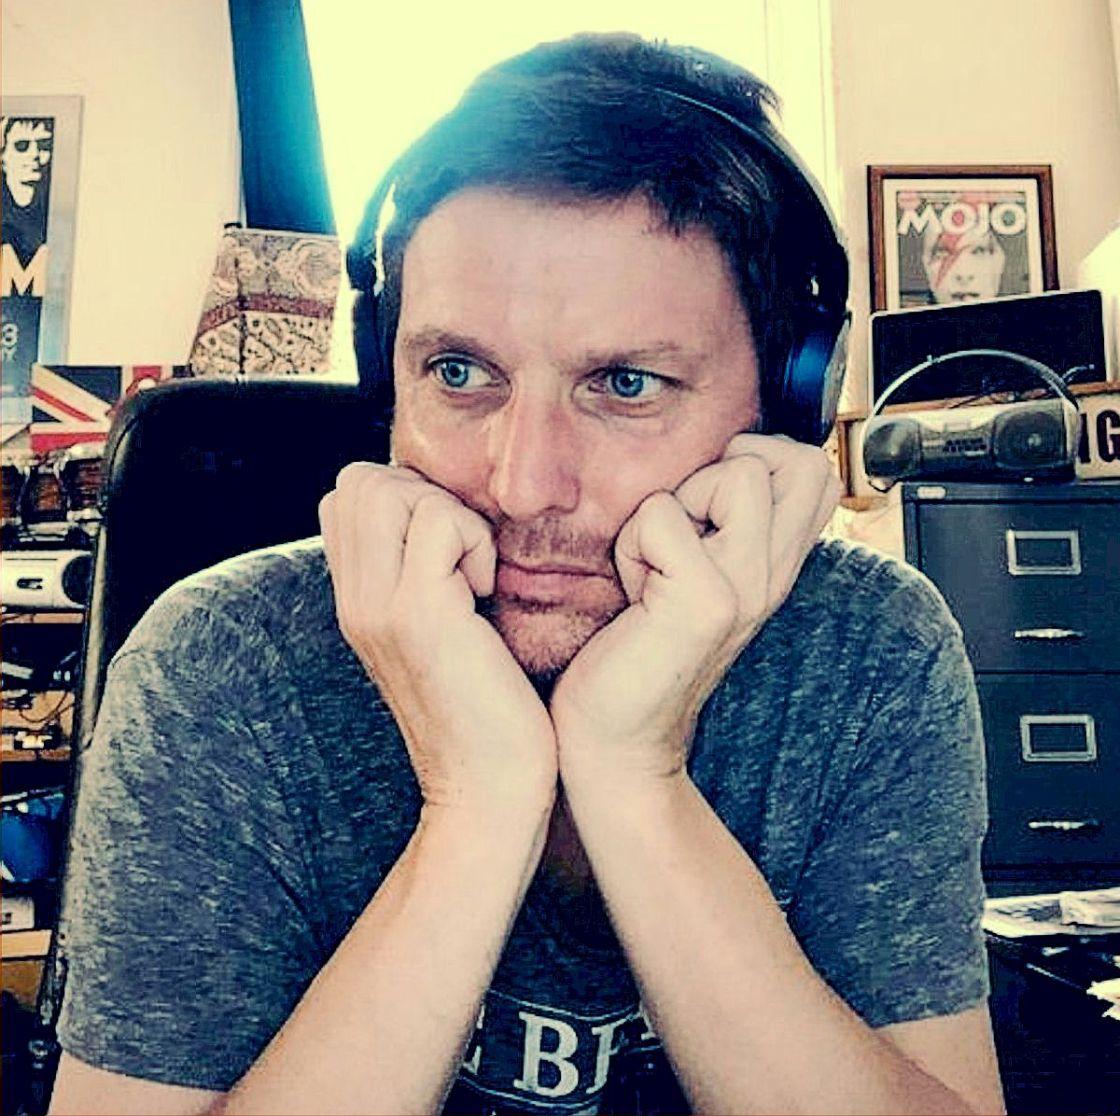 Adam Norsworthy pondering